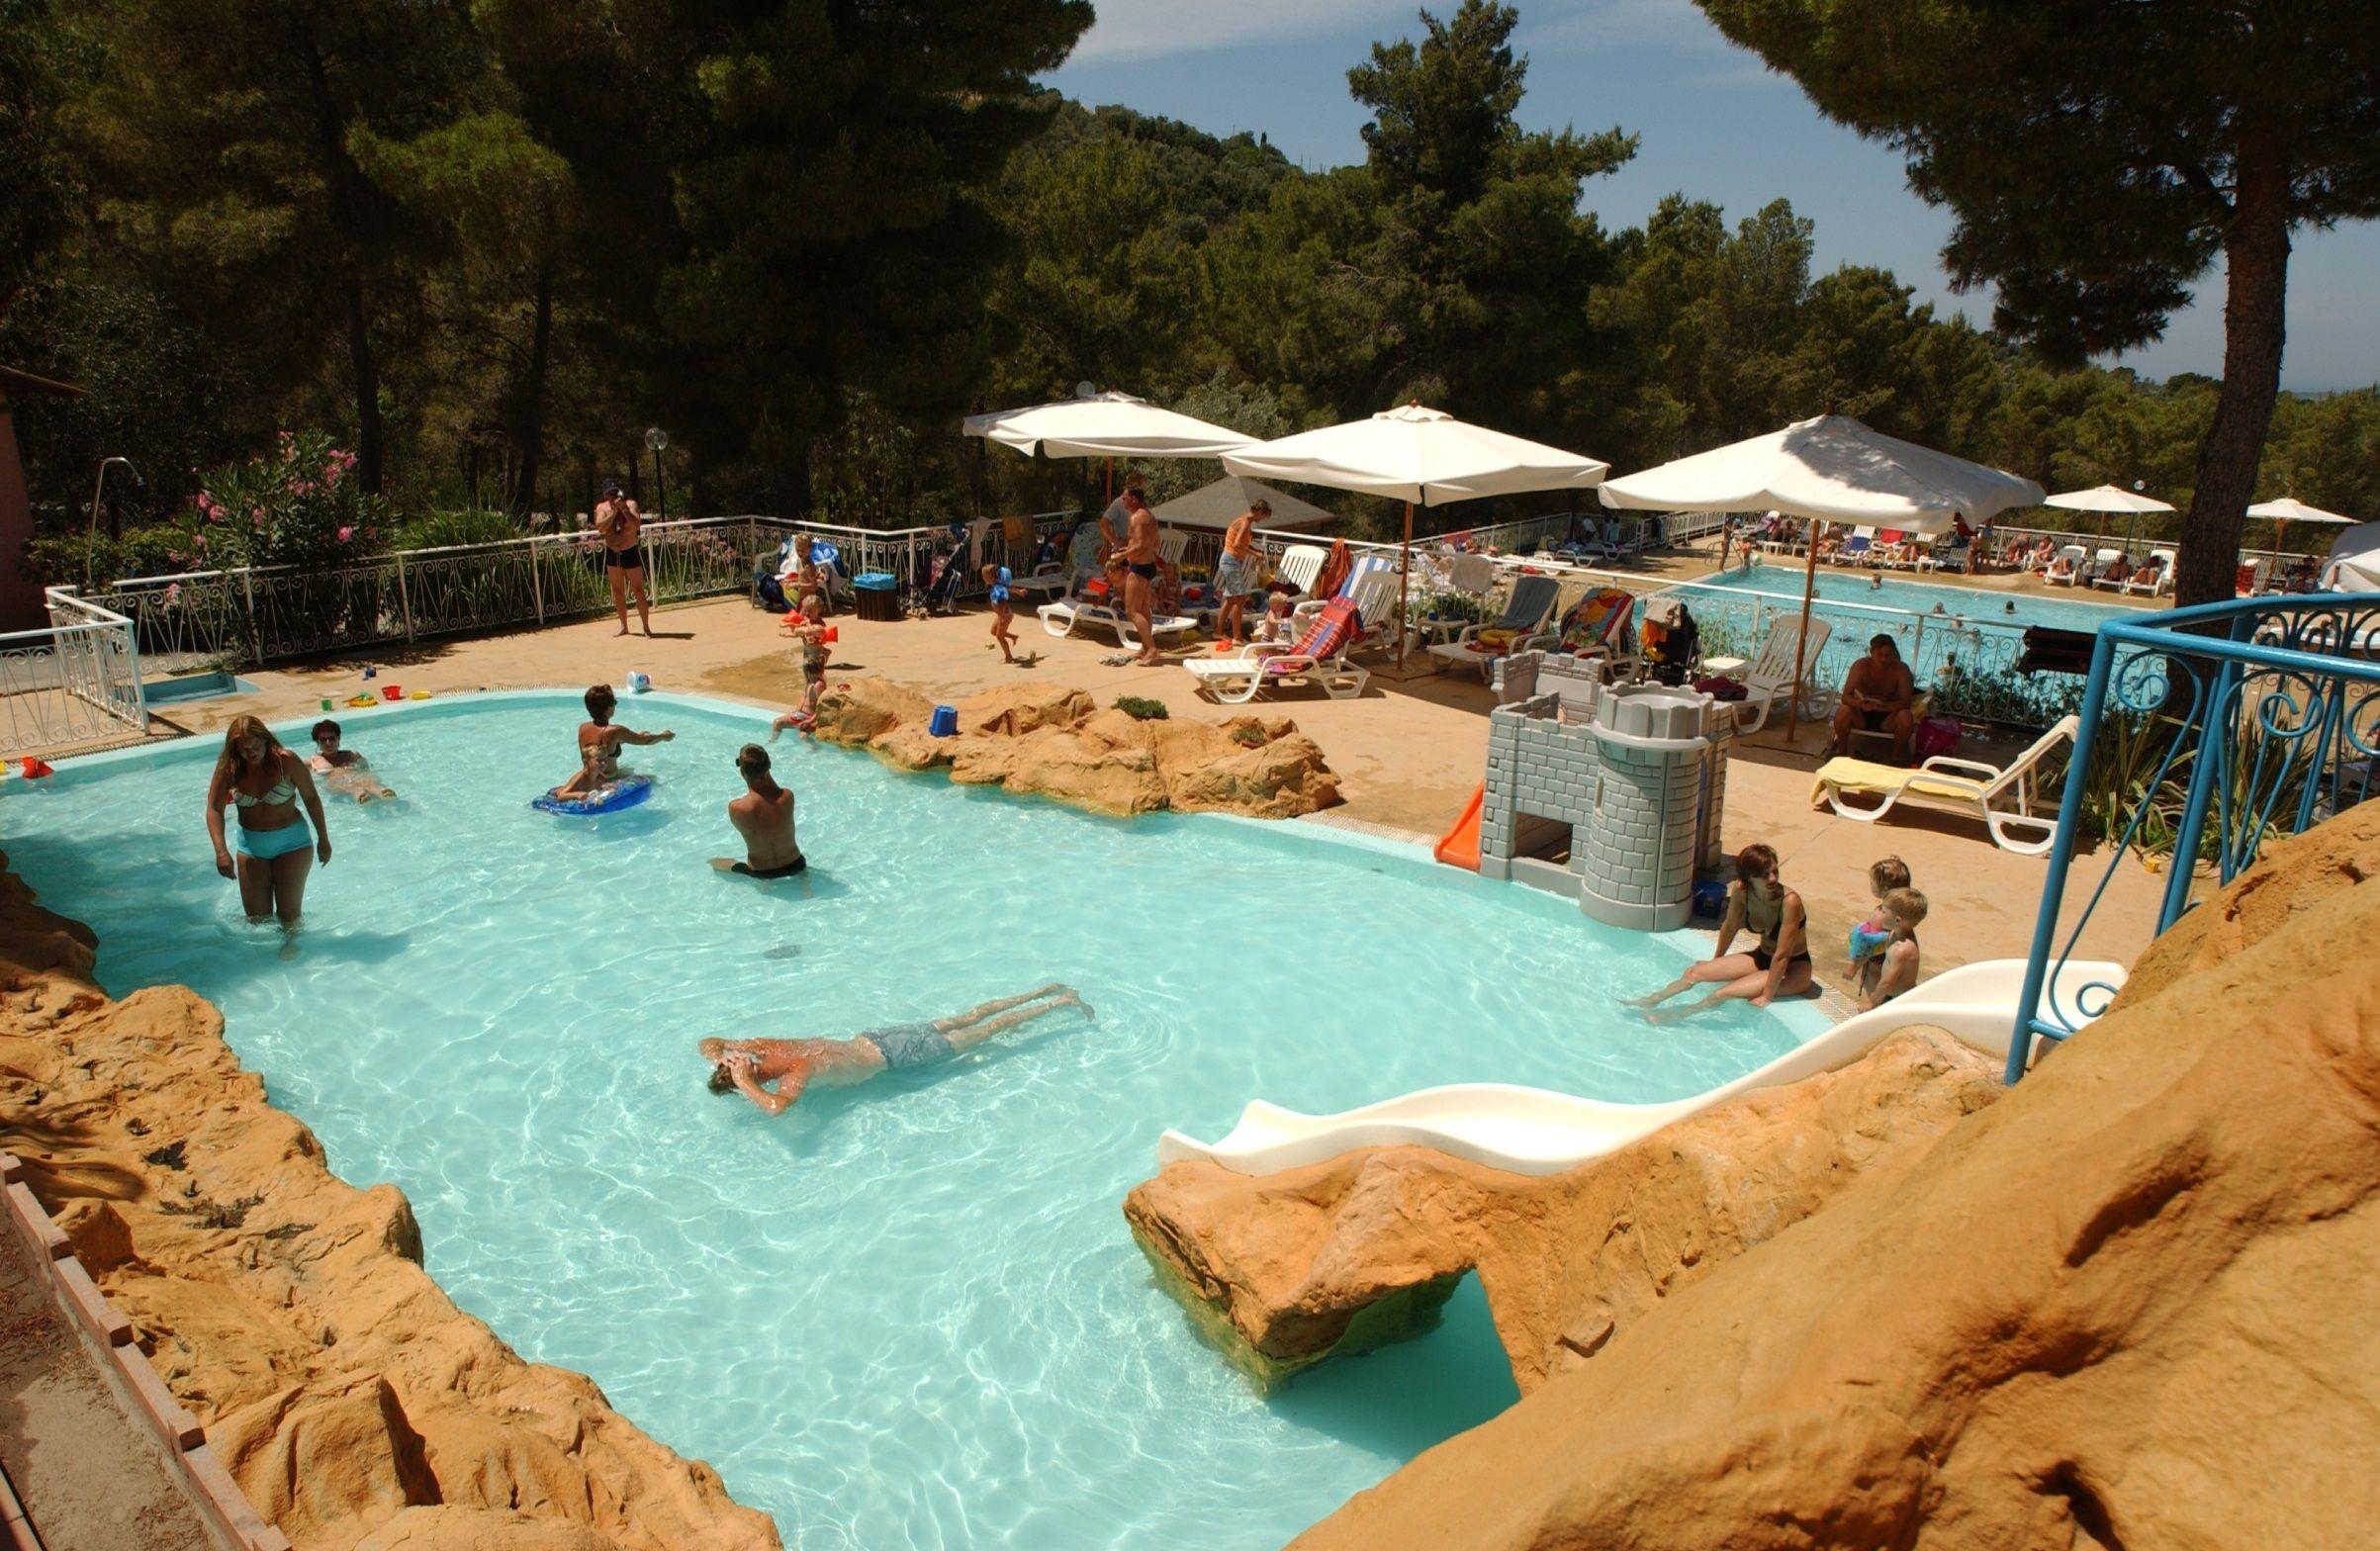 Kinderzwembad Op Camping Le Pianacce Buitenleven Tent Italie